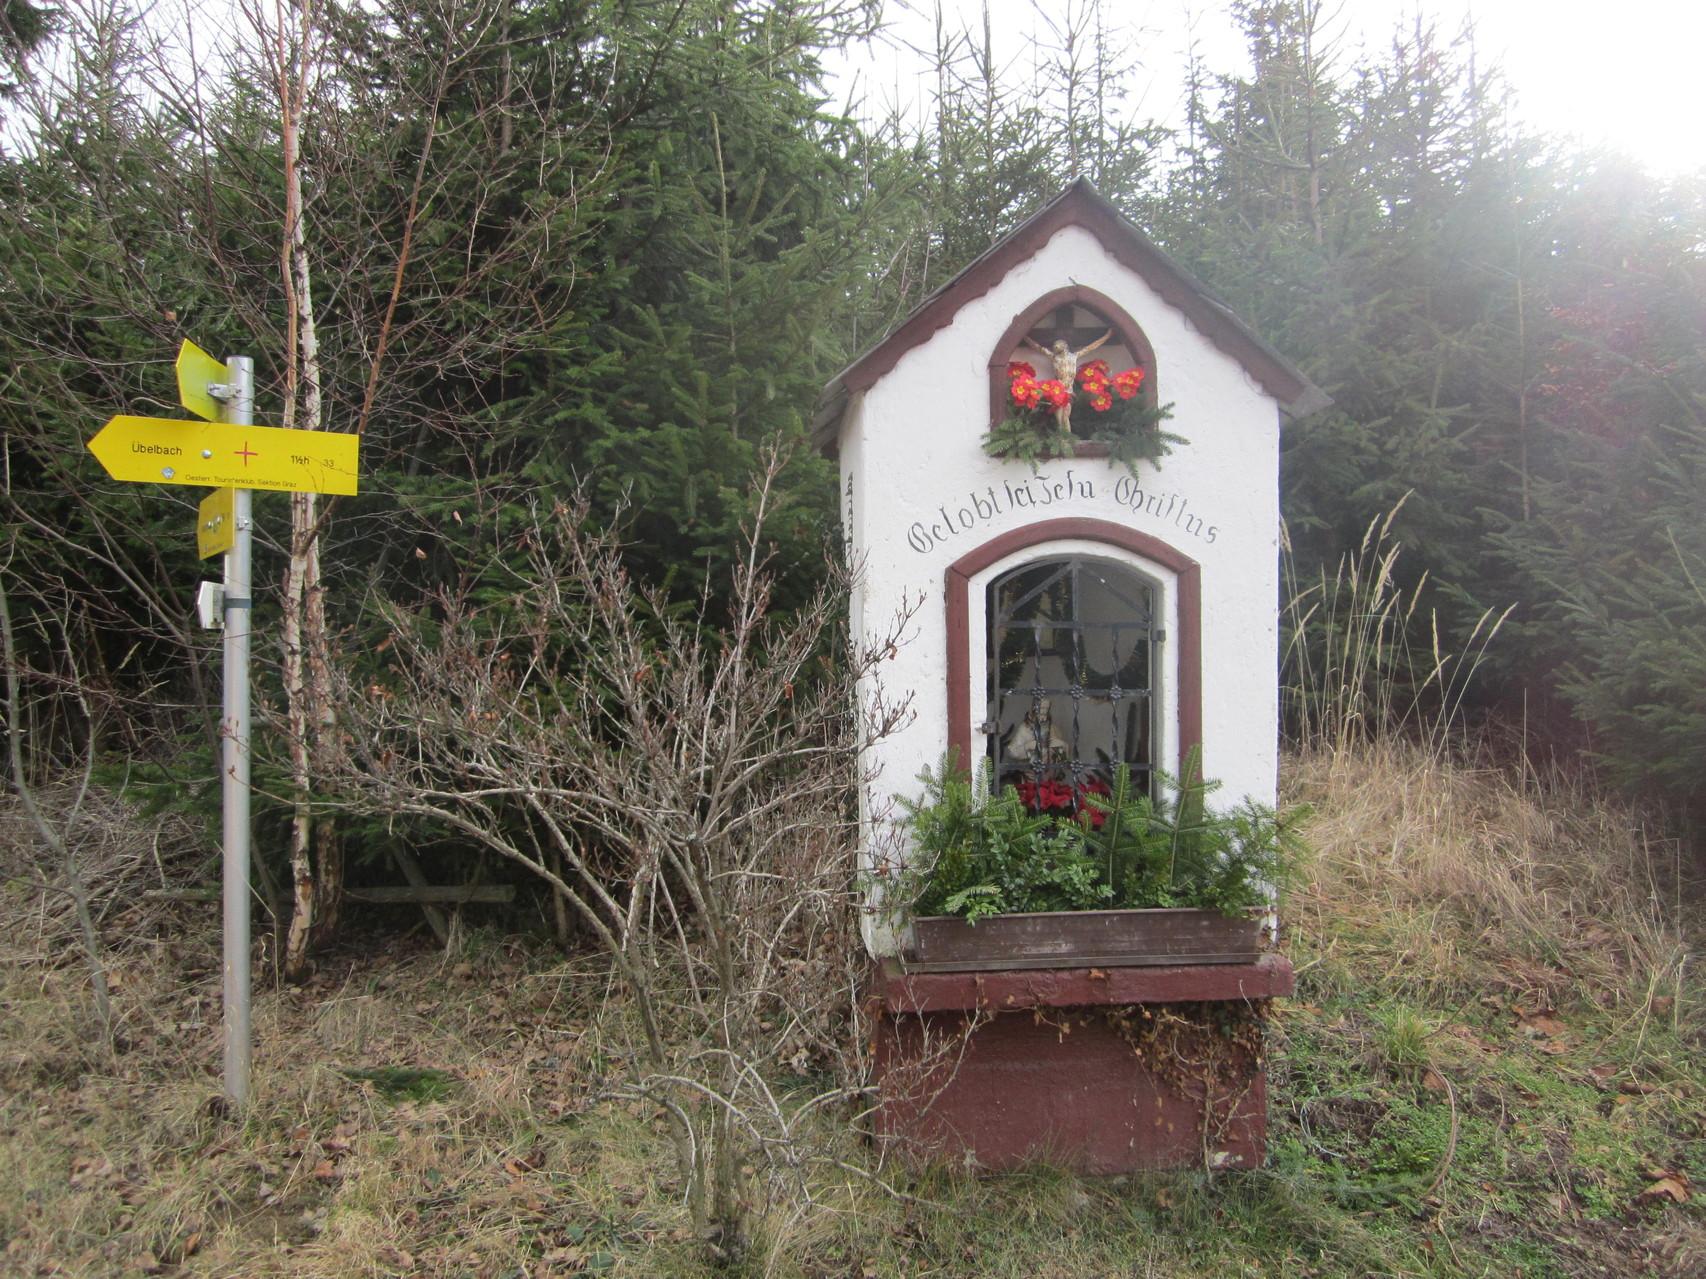 Taschlerkreuz